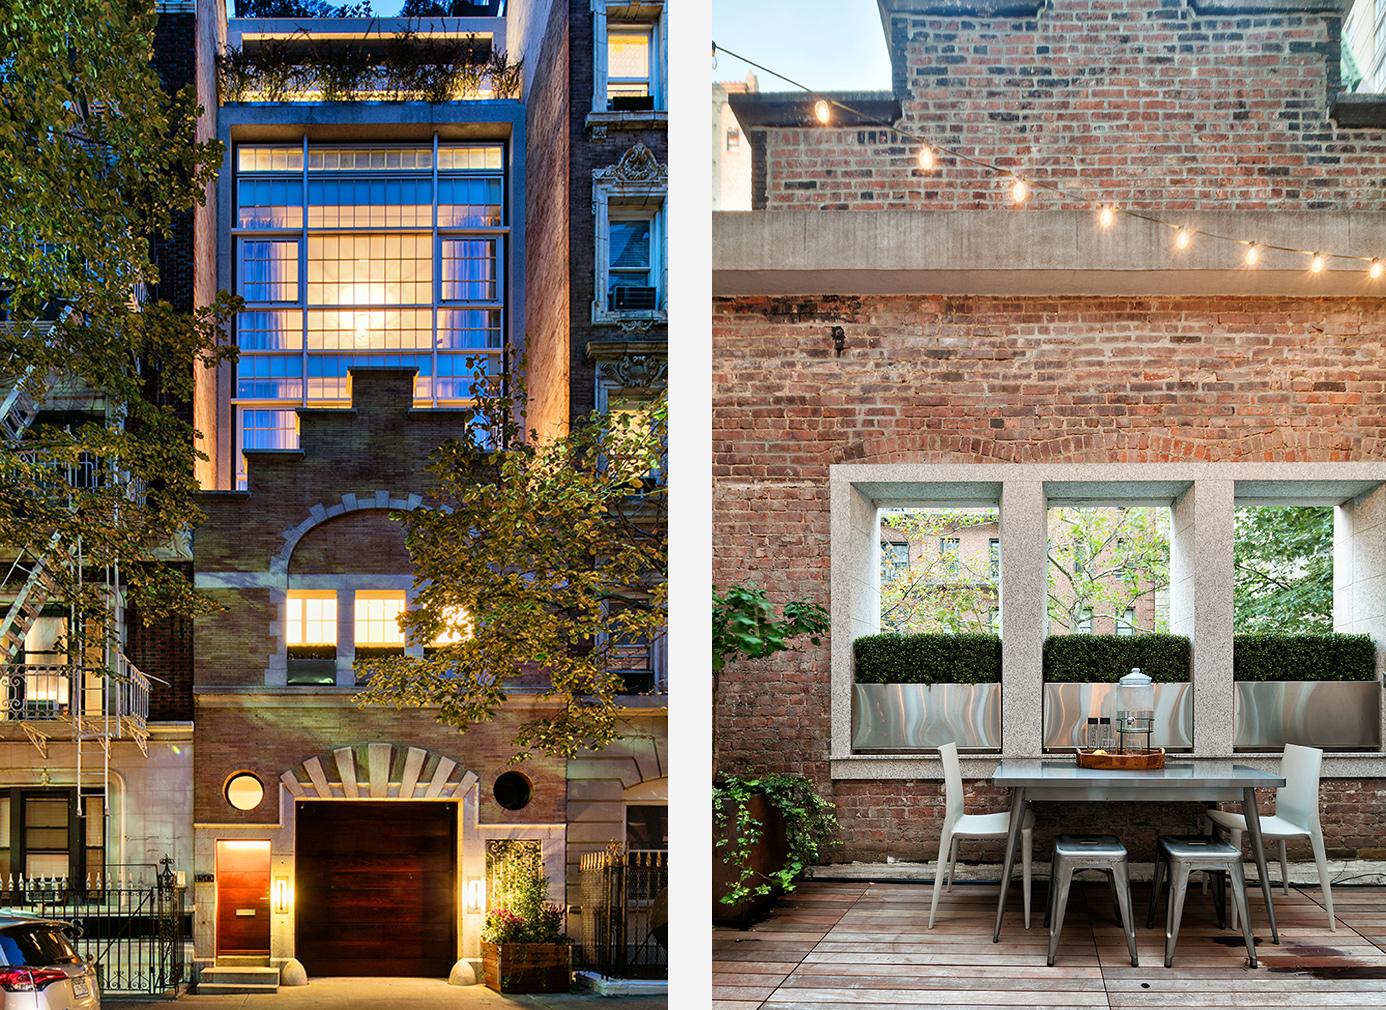 Gramercy park townhouse for sale uma thurman new york home for Townhouse for sale in manhattan